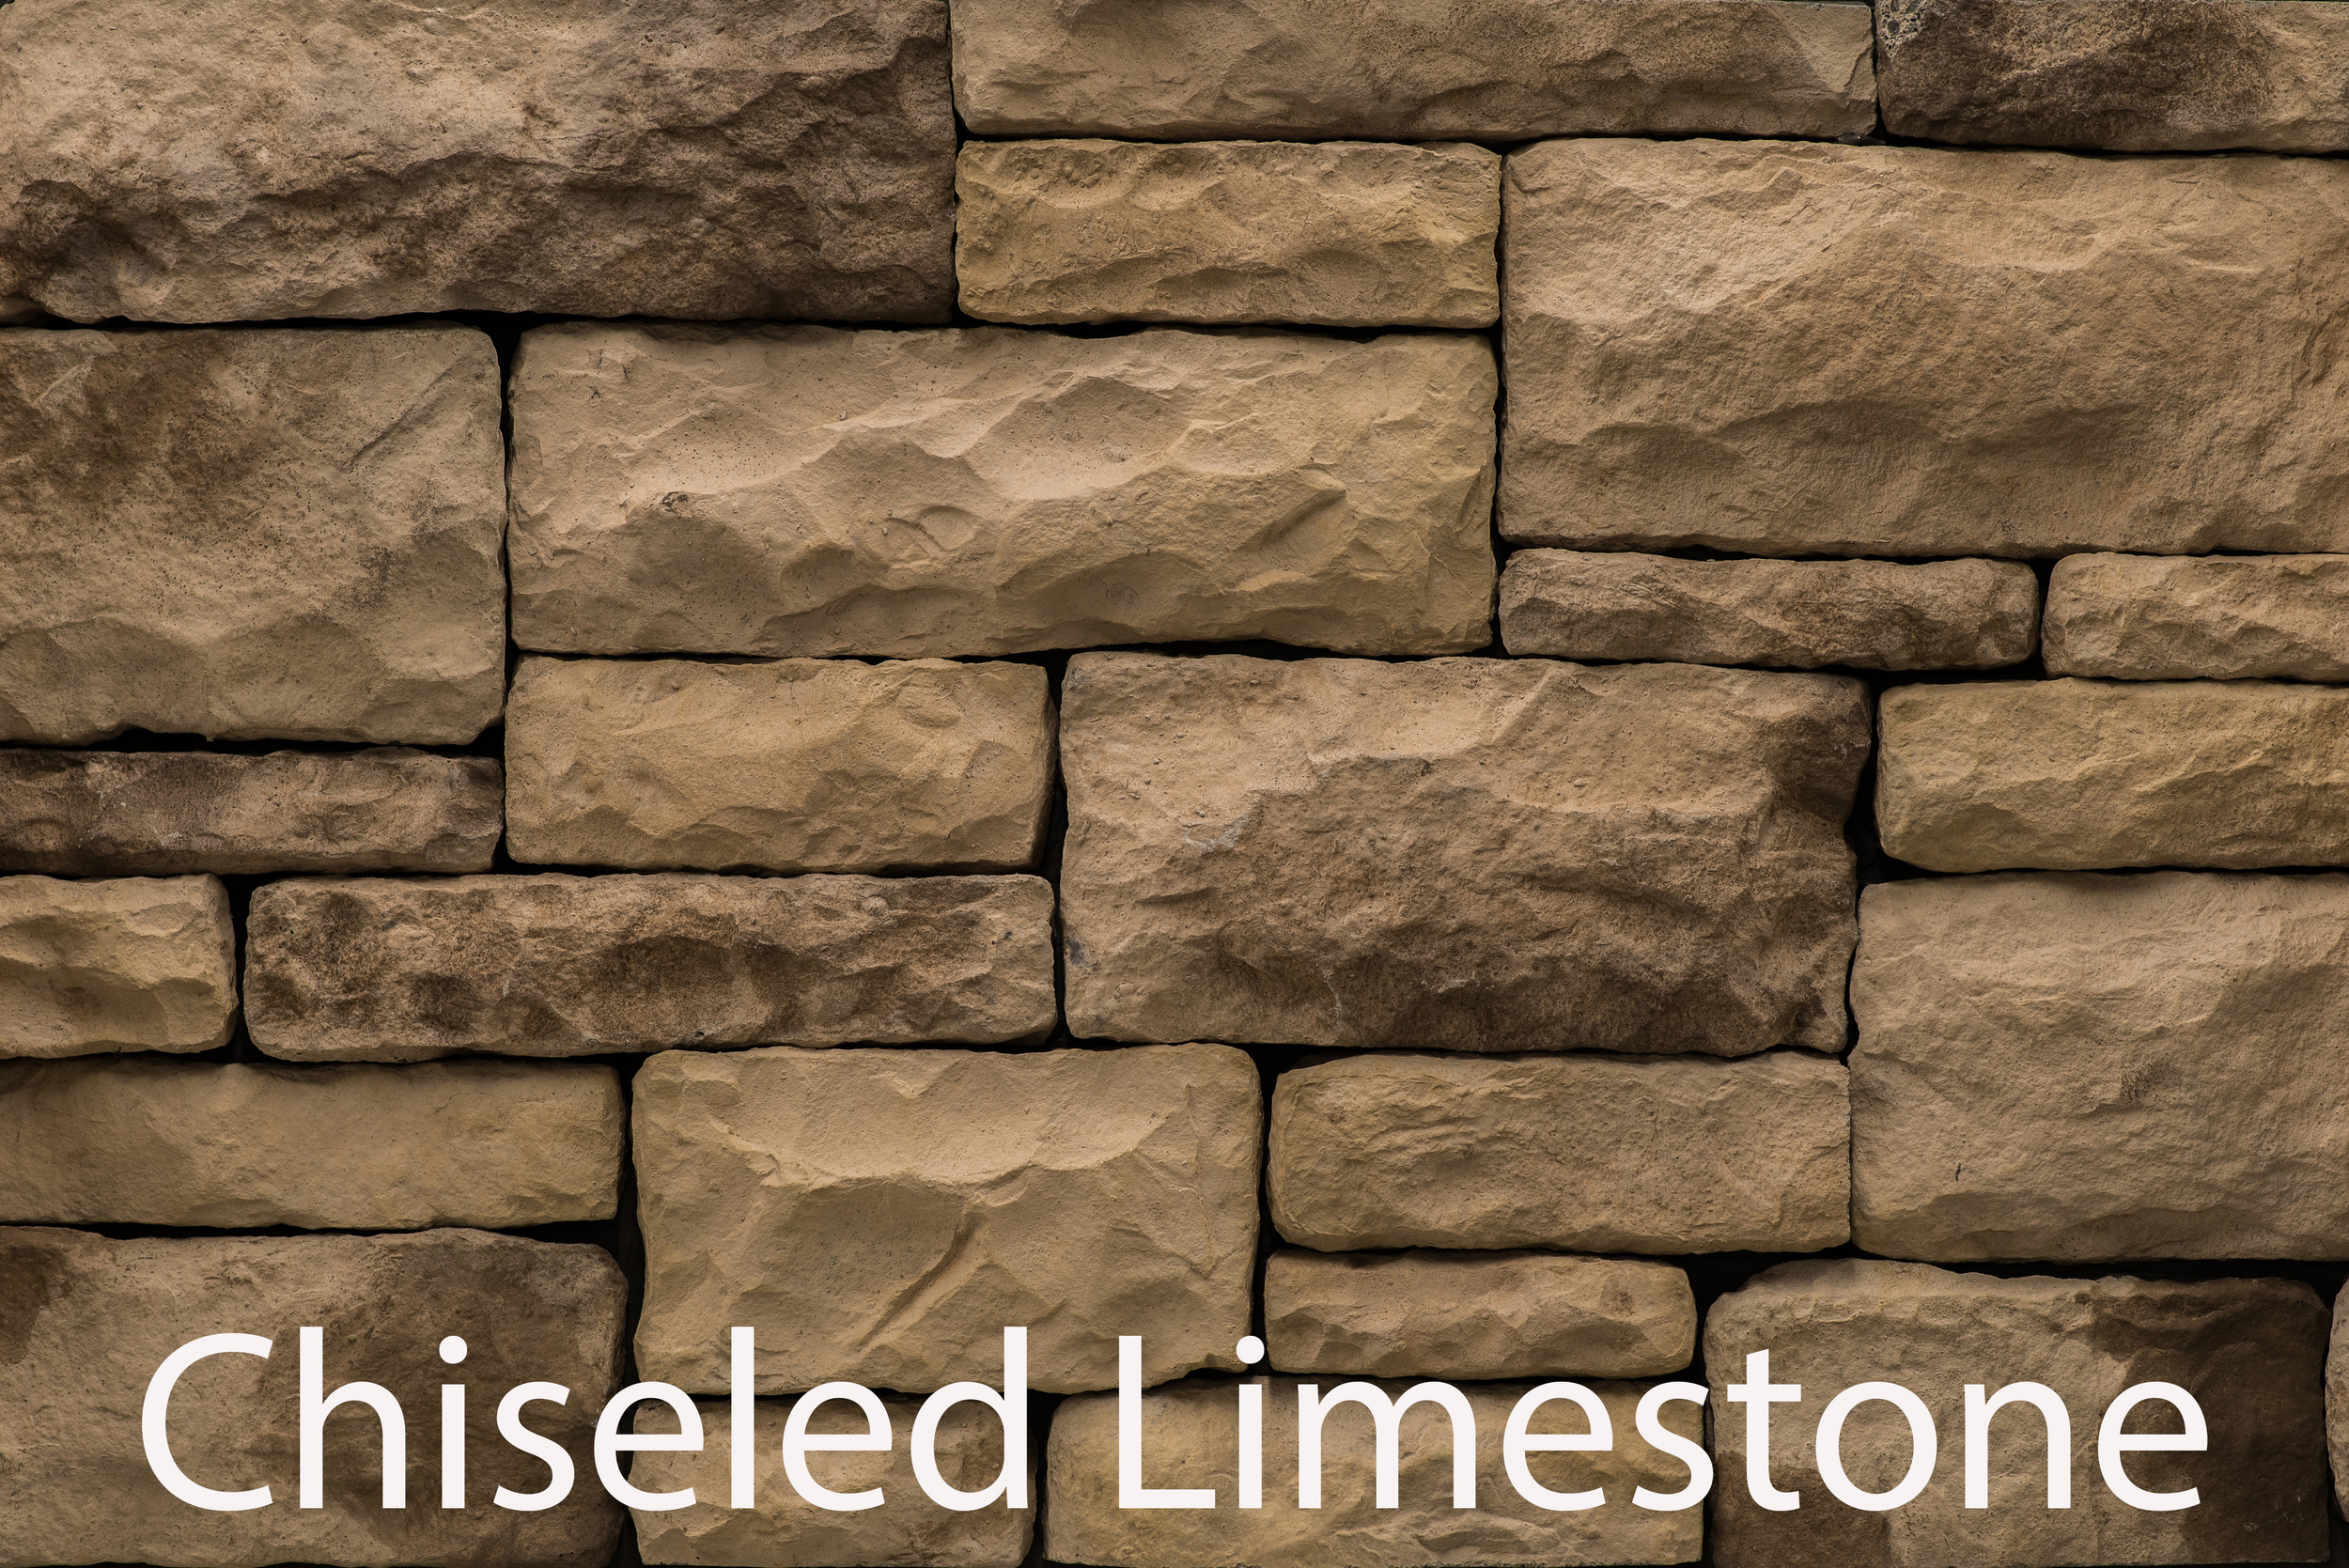 Chiseled Limestone - Sandstone